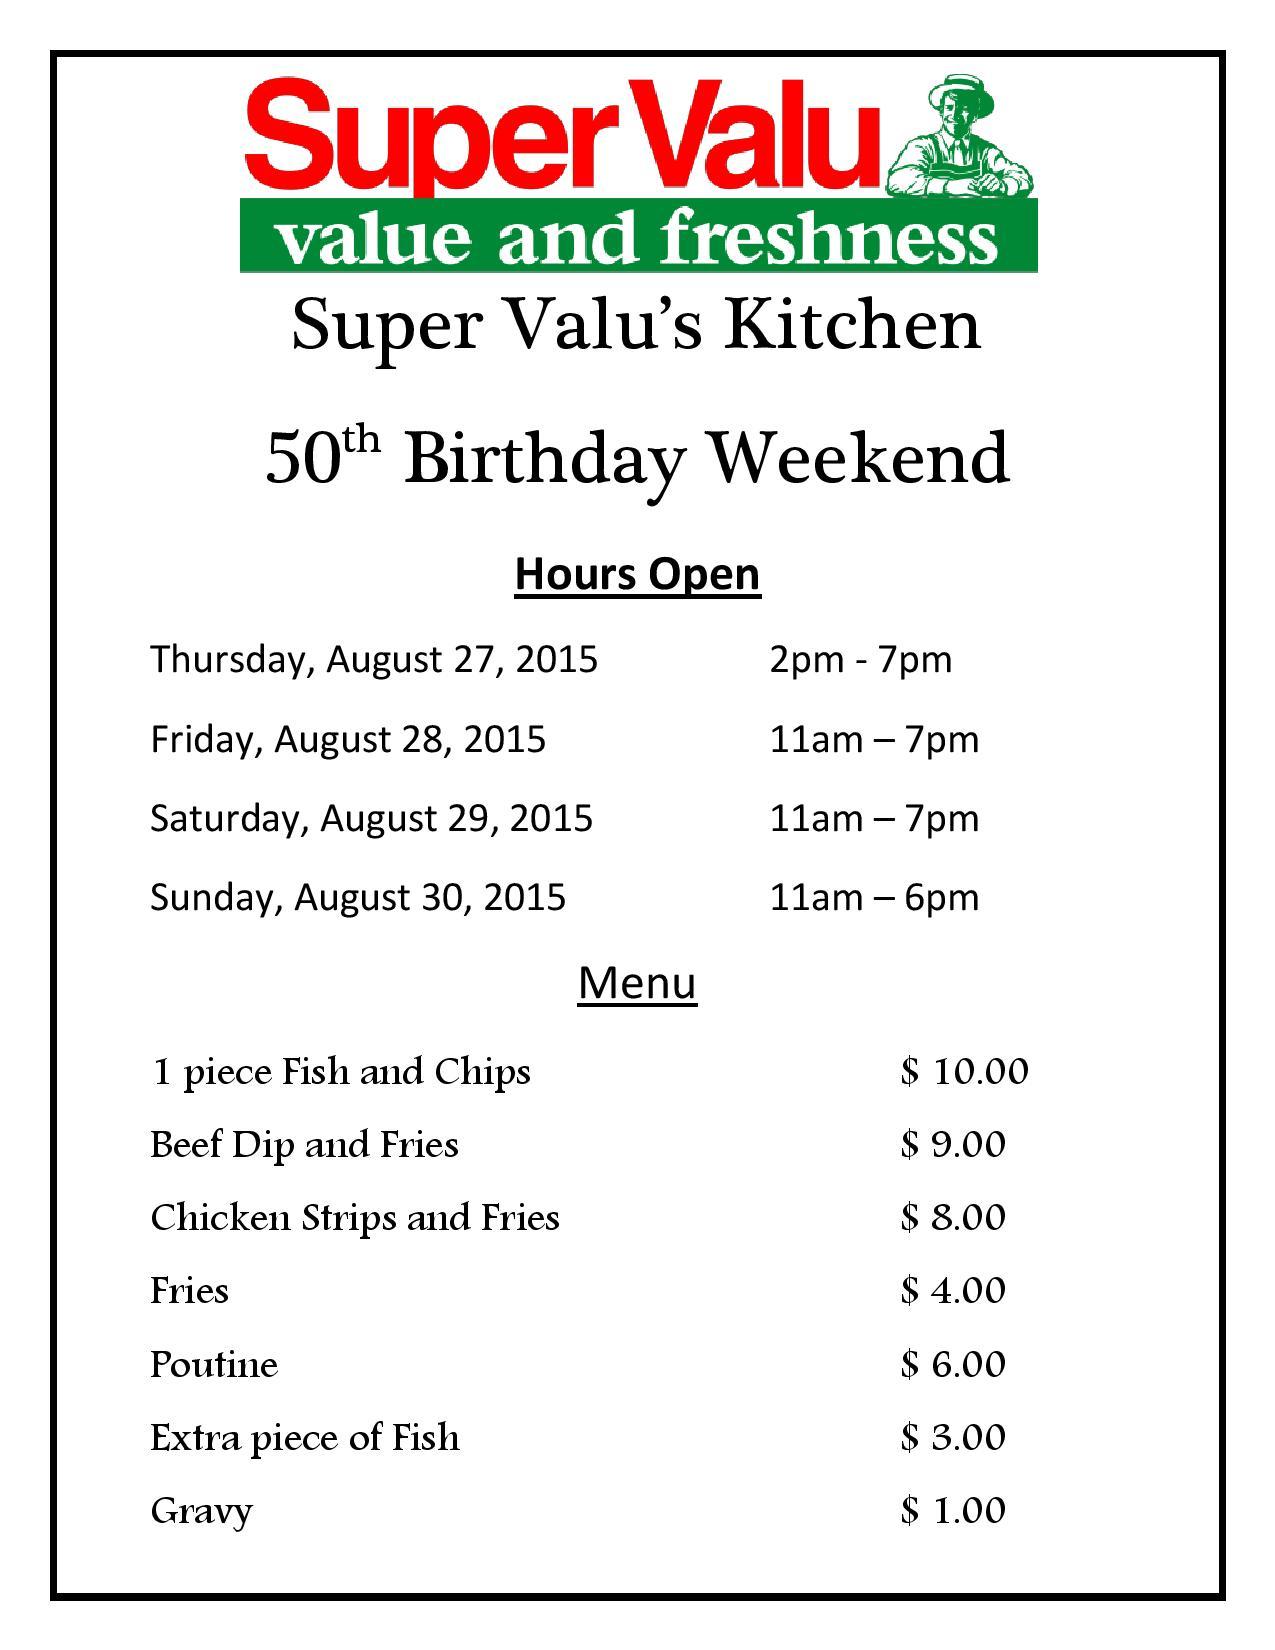 50th birthday menu at super valu 繧筬 gold river buzz